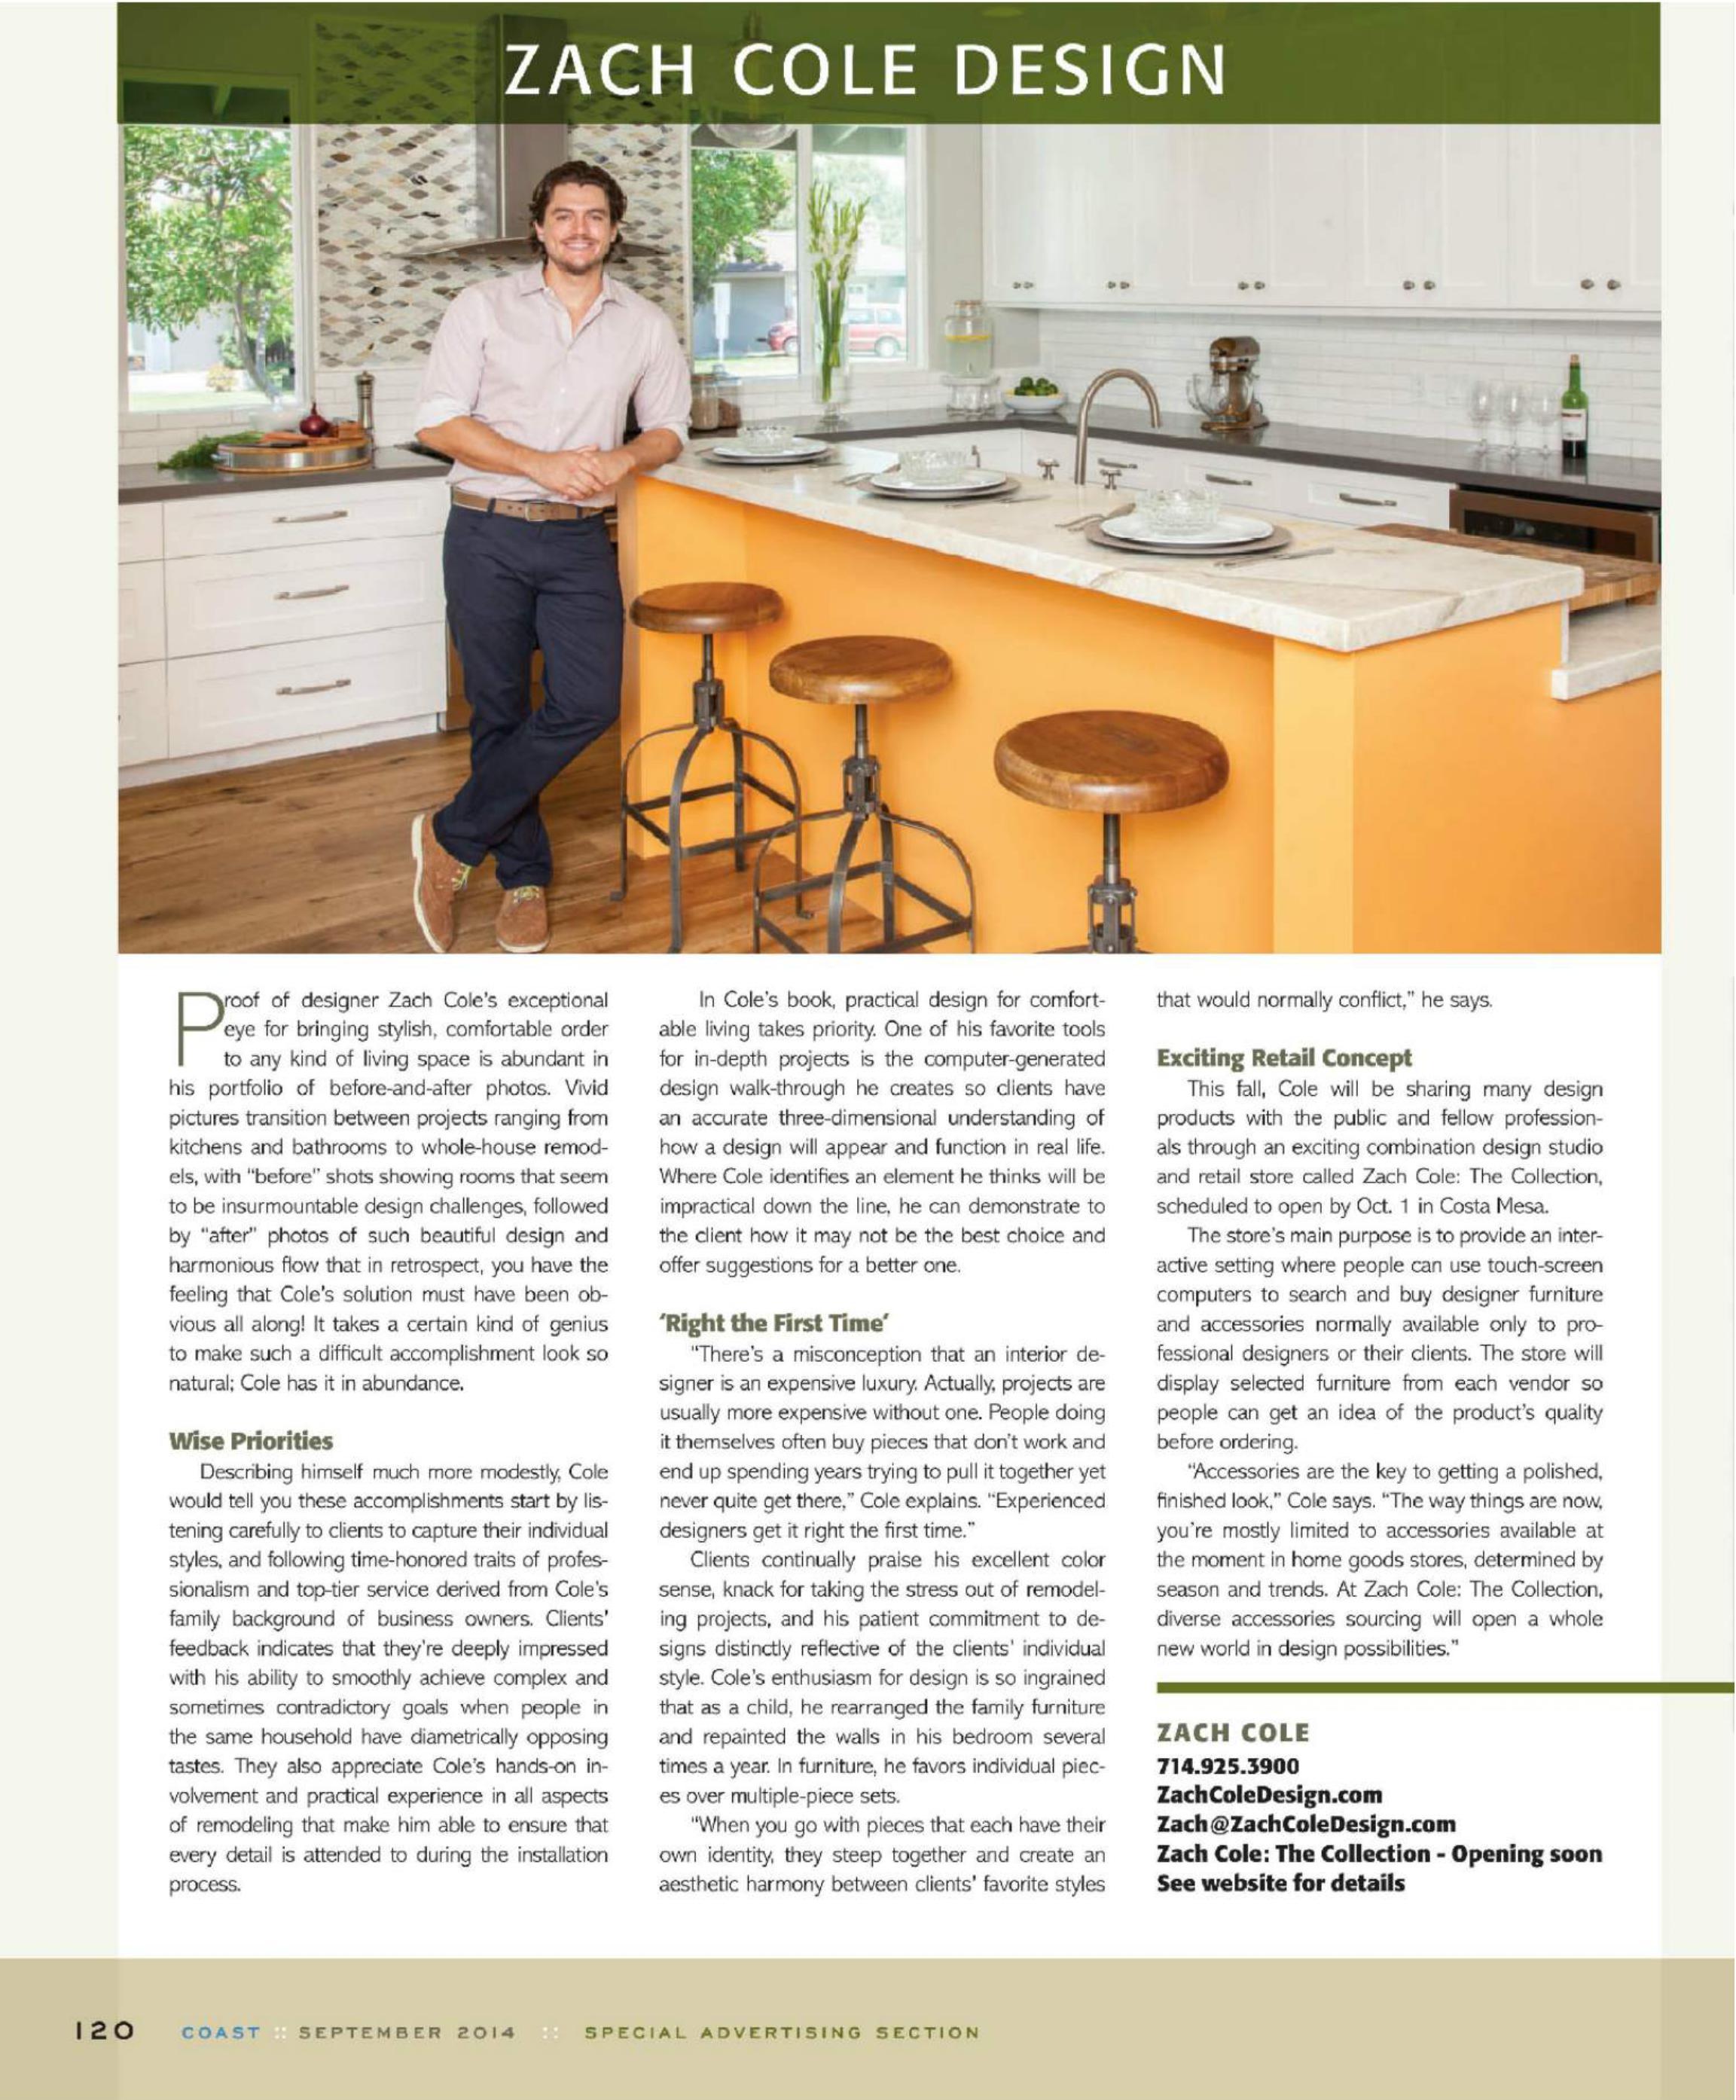 Zach Cole Design-Orange-County-Interior-Designer-Coast Magazine - Sept 2014